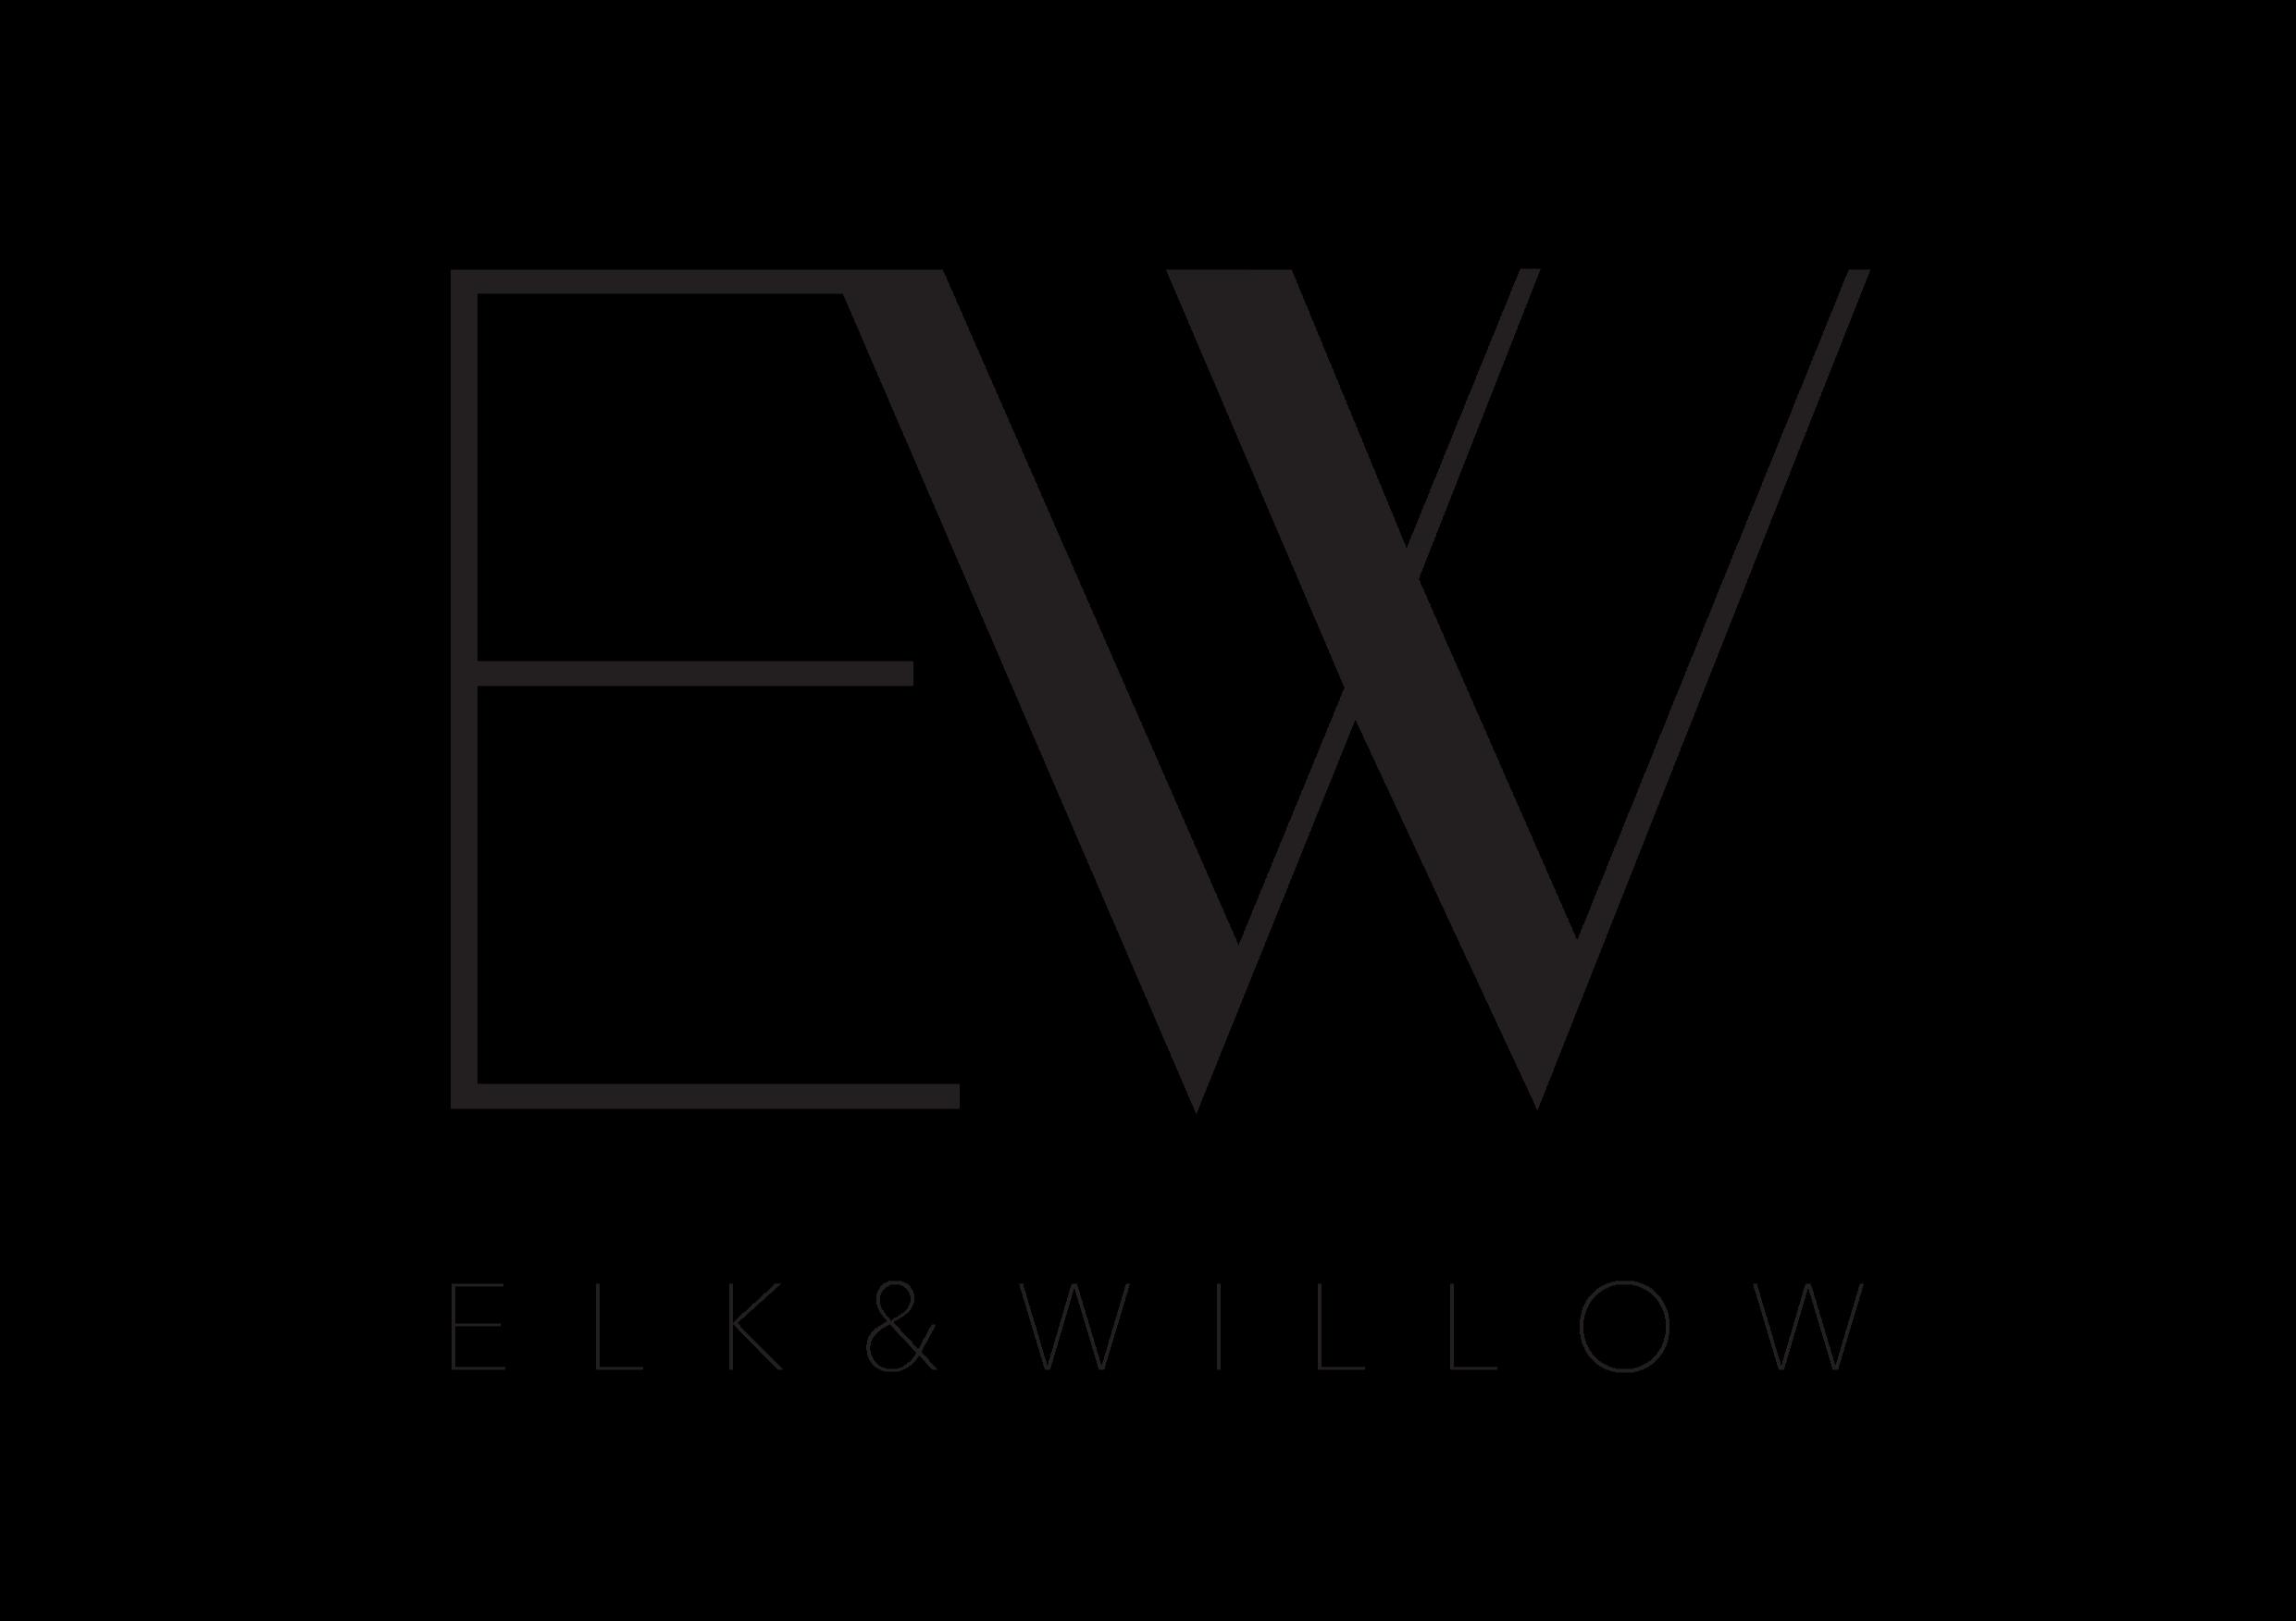 Elk & Willow | Identity Refresh